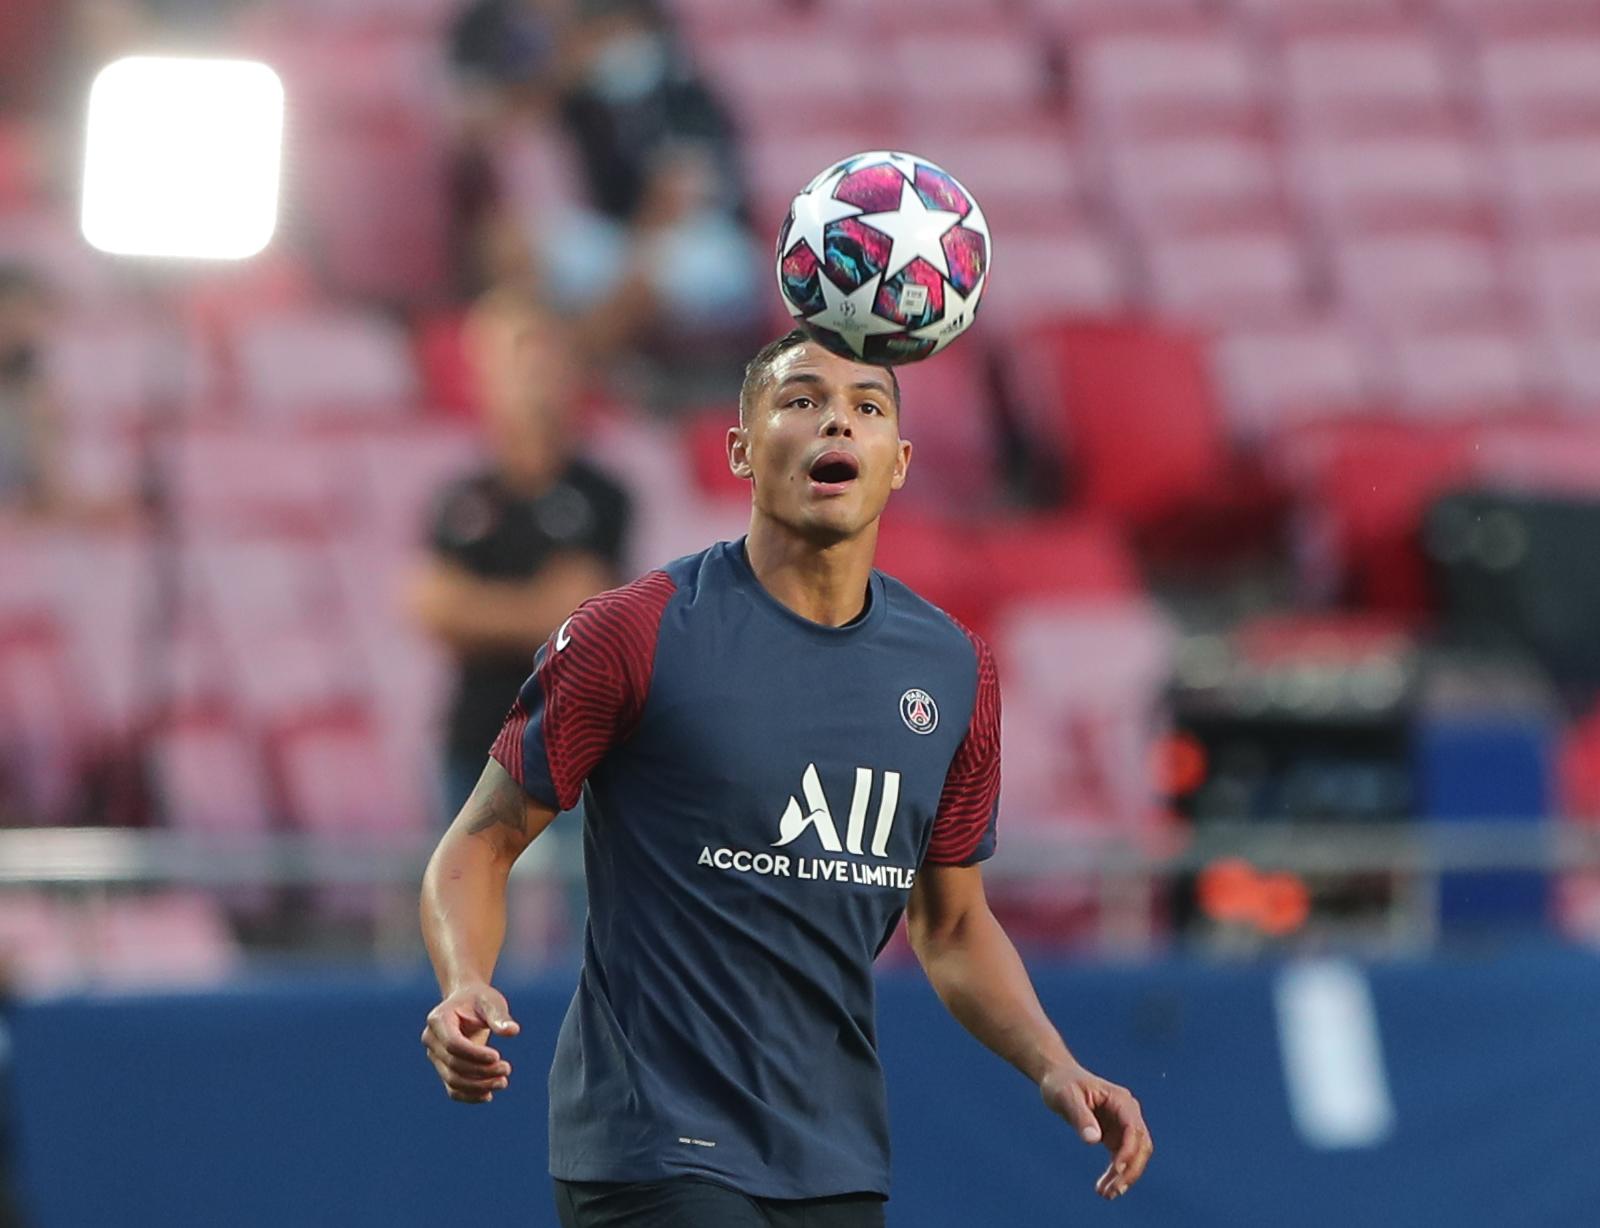 Paris St Germain's Thiago Silva during training. Photo: Reuters